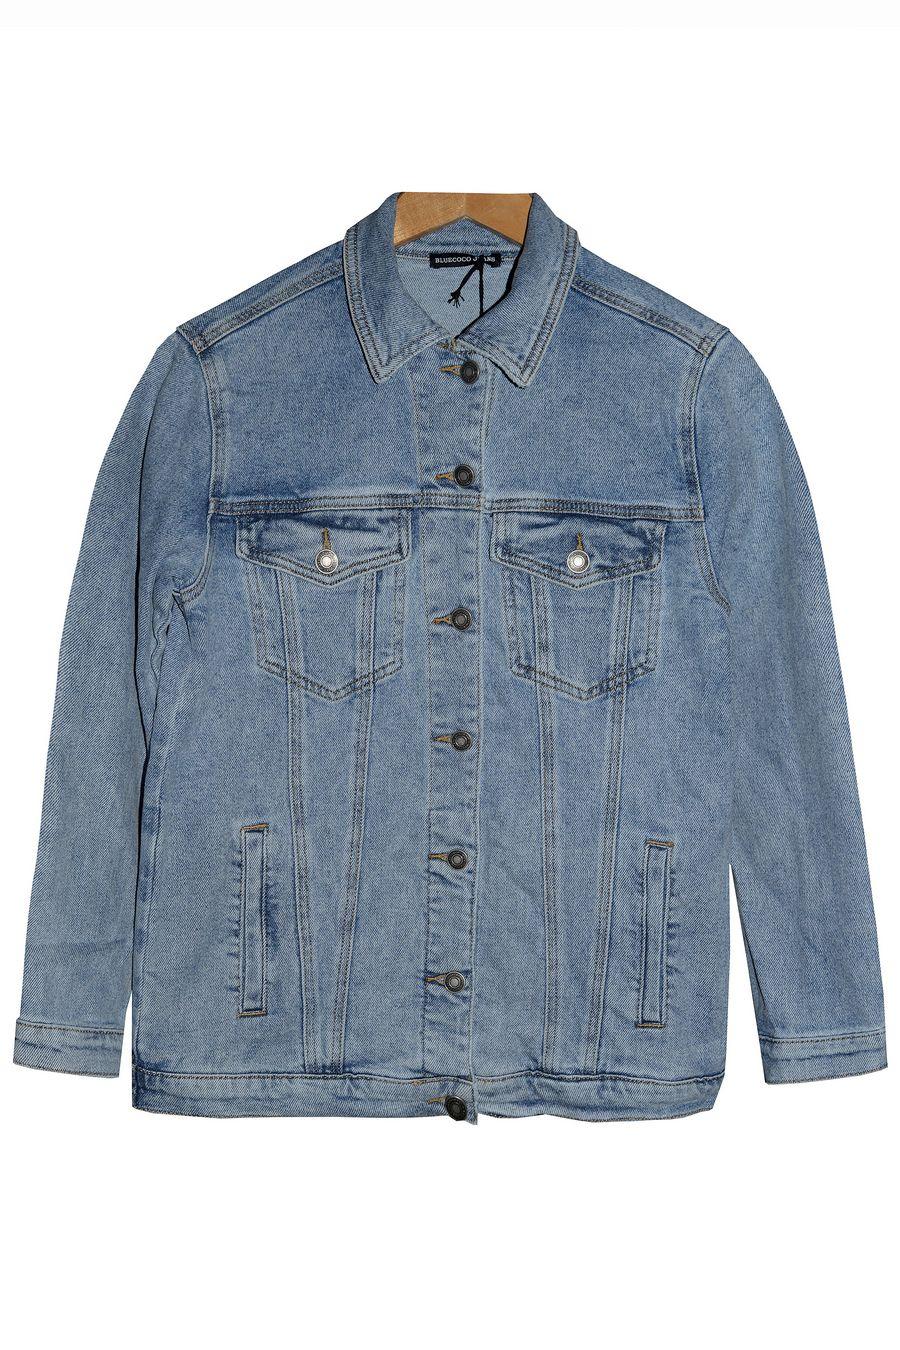 Куртка женская Blue Coco 127 - фото 1